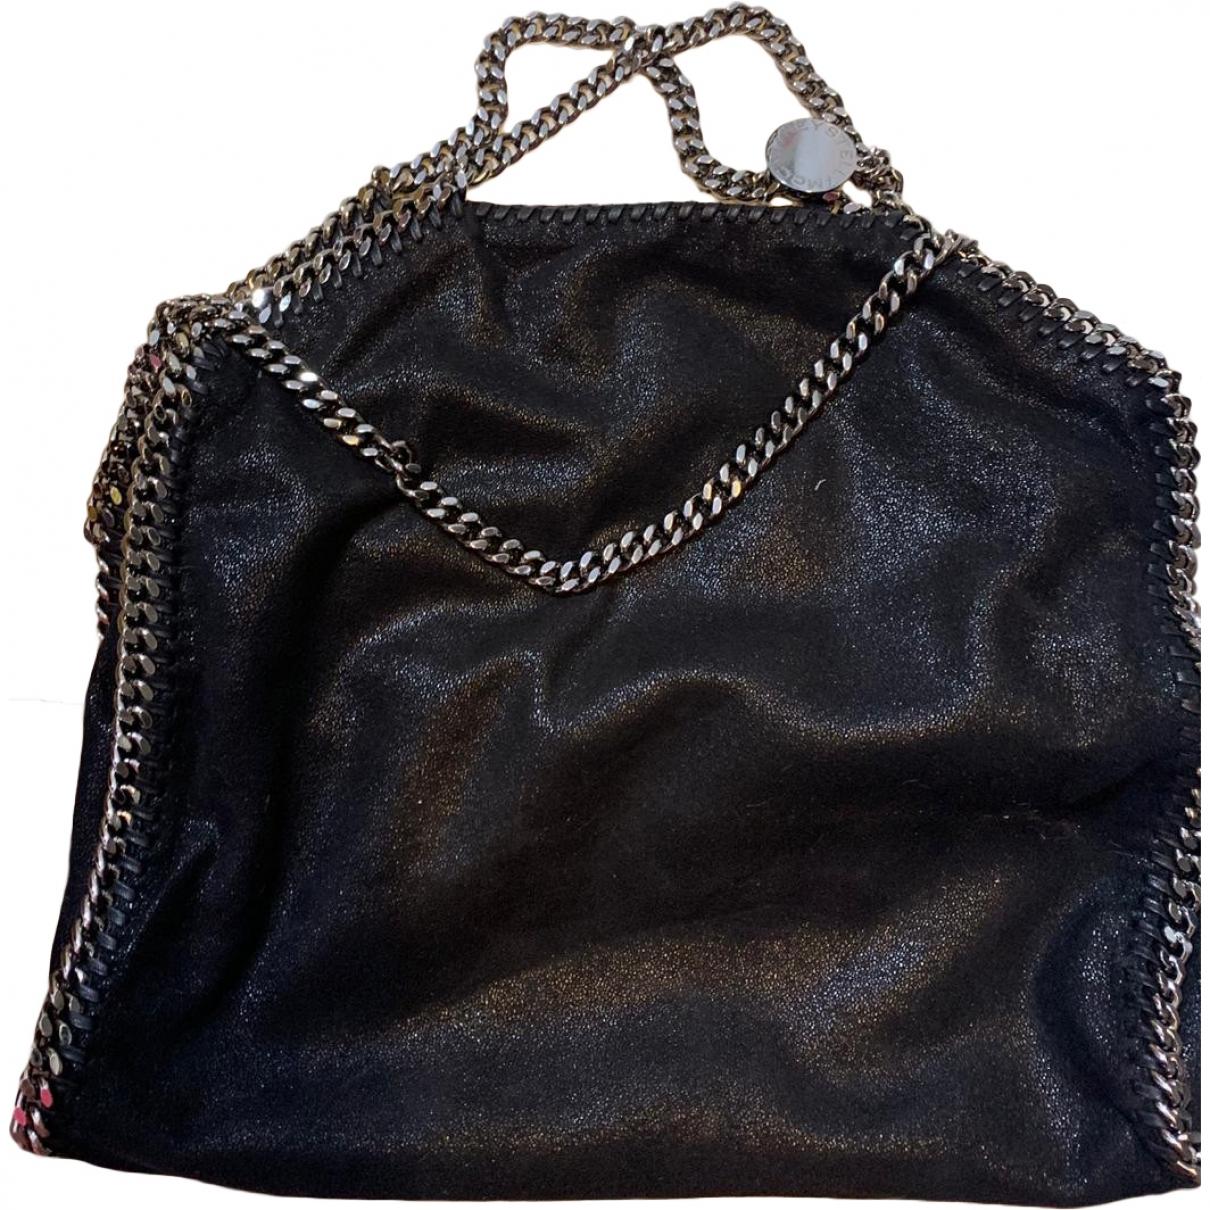 Stella Mccartney - Sac a main Falabella pour femme en toile - noir